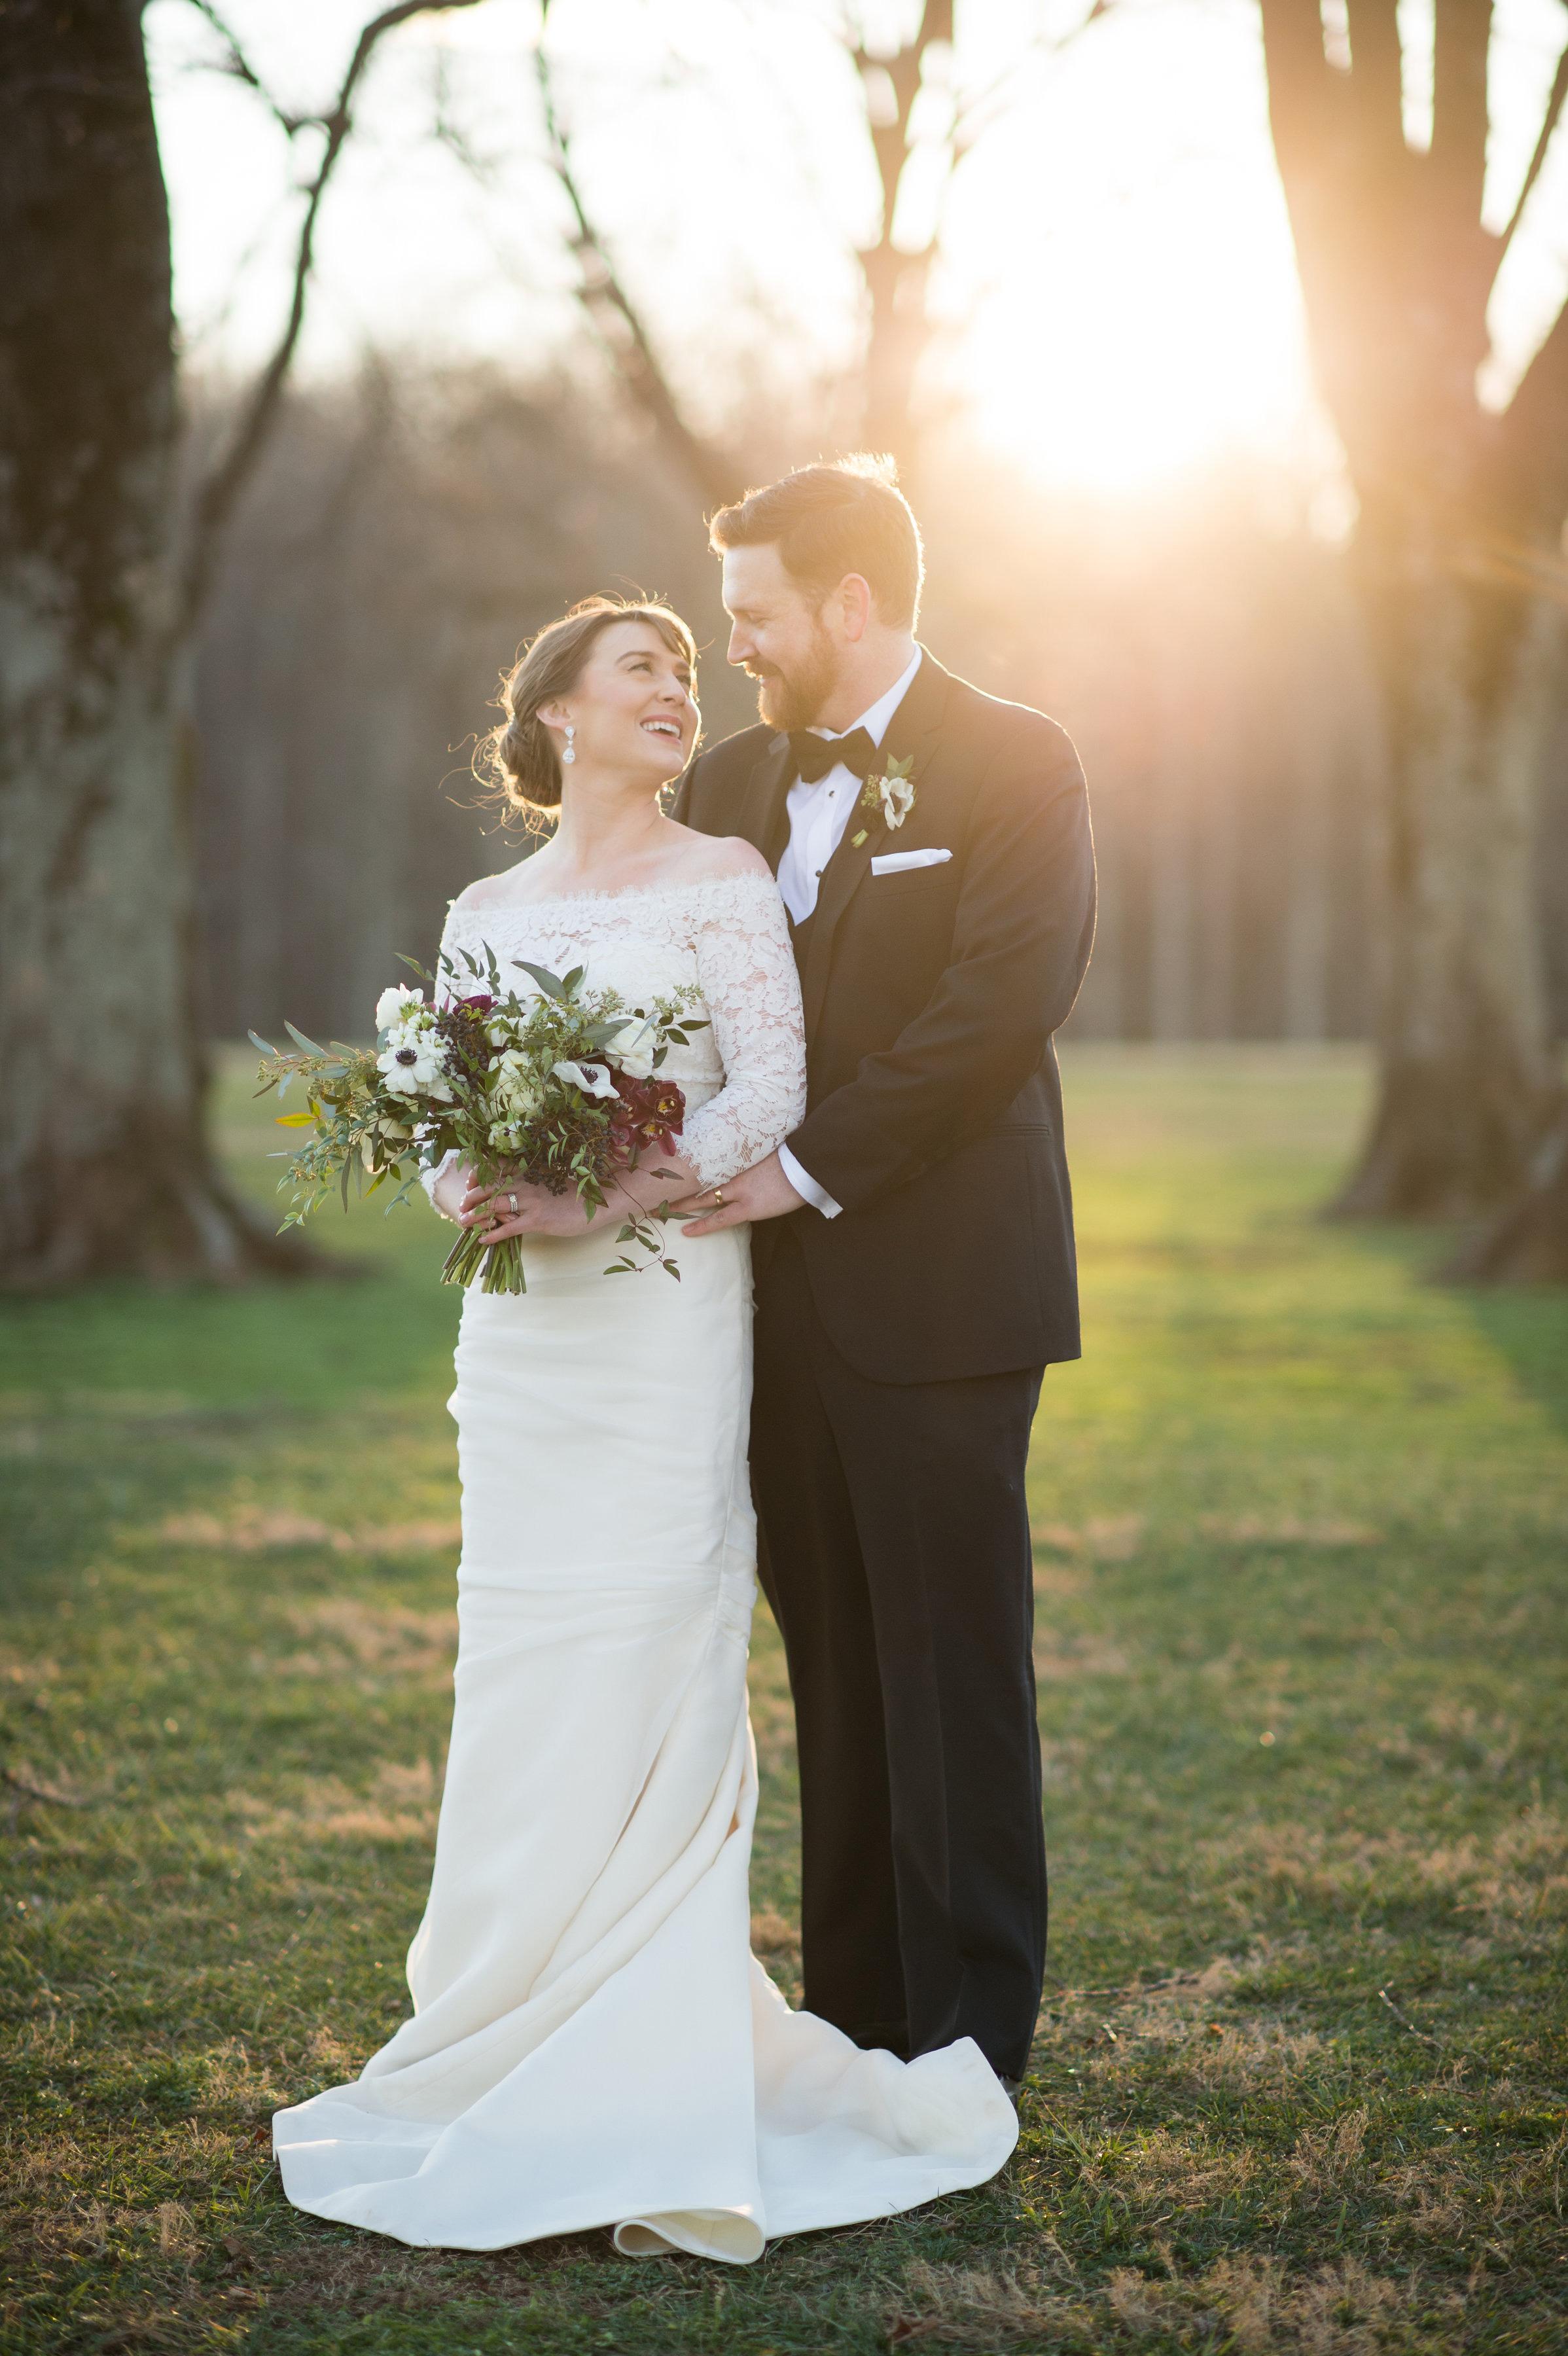 Todd woodruff wedding